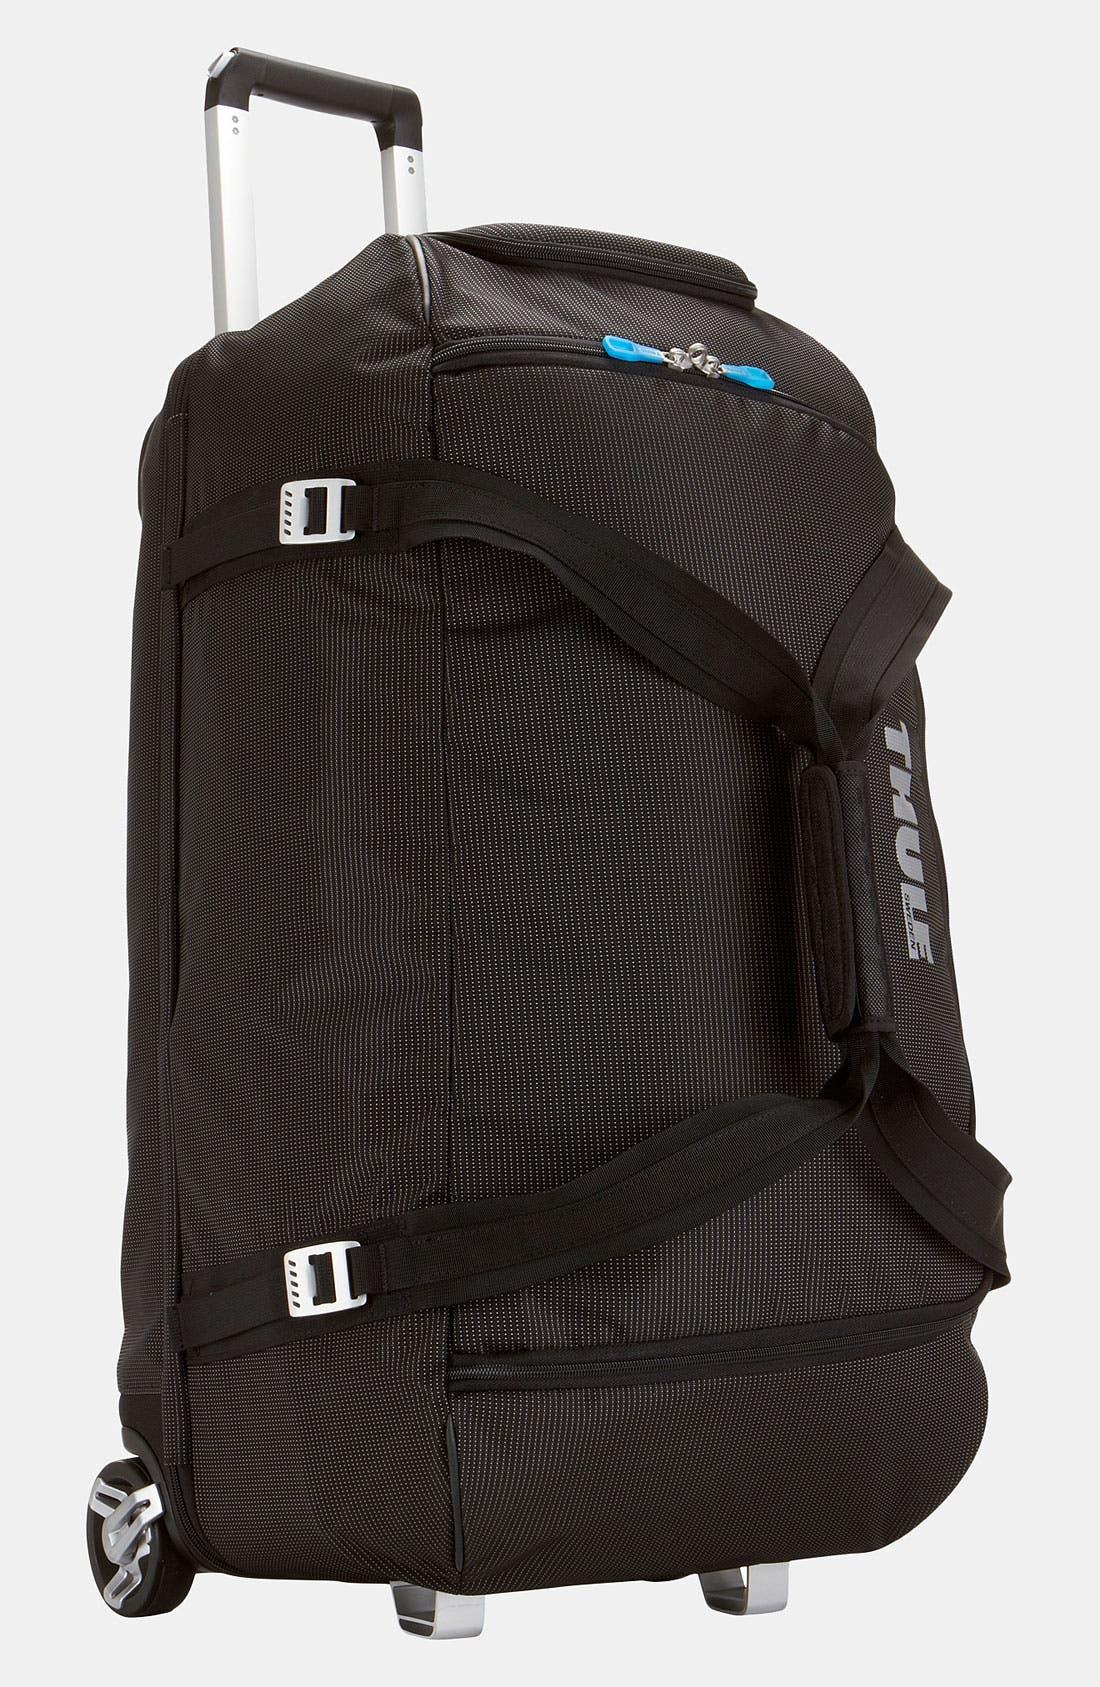 Thule 'Crossover' Rolling Duffel Bag (87L)